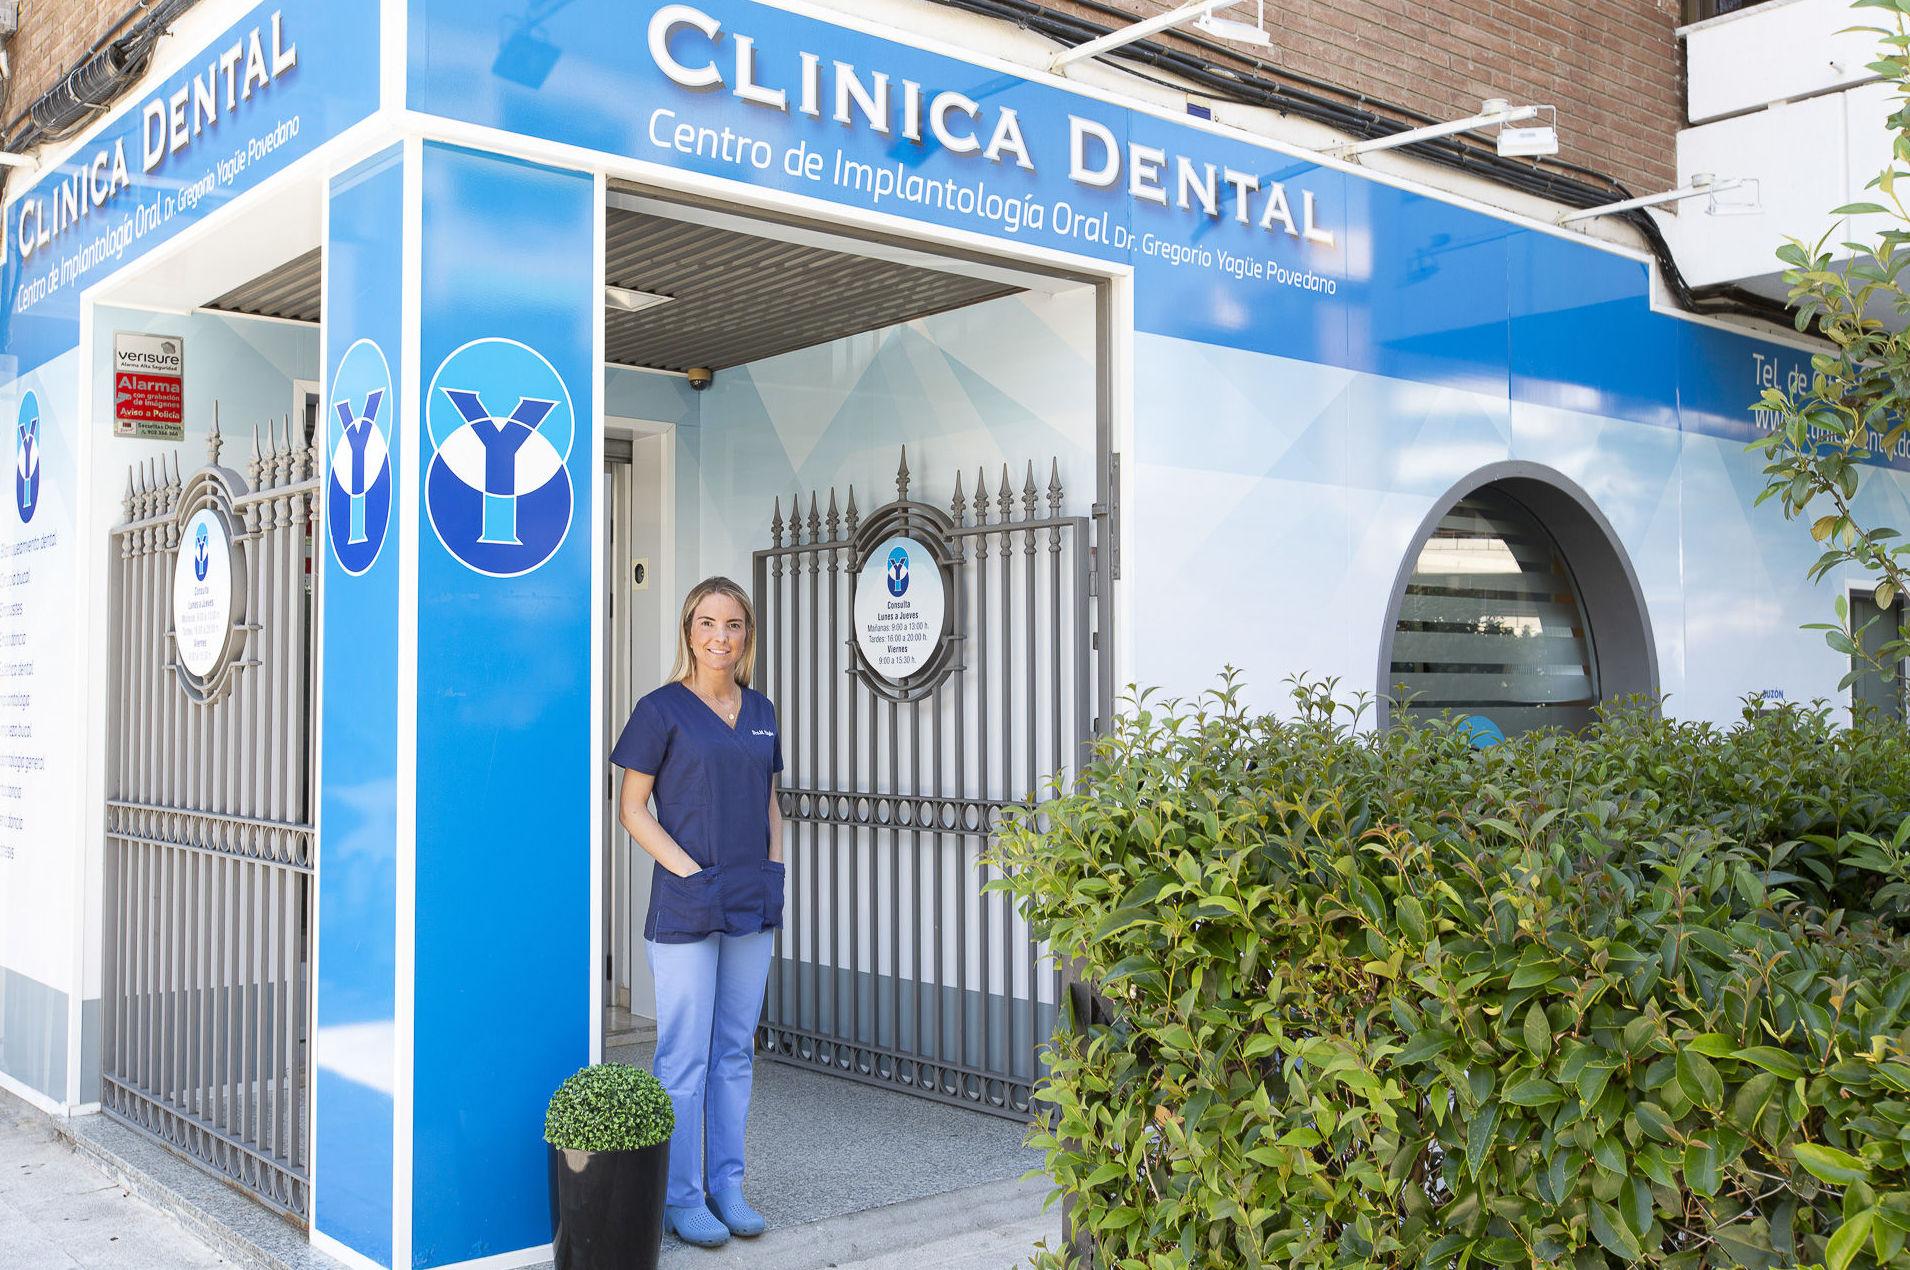 Clinica Dental Dr. Yagüe